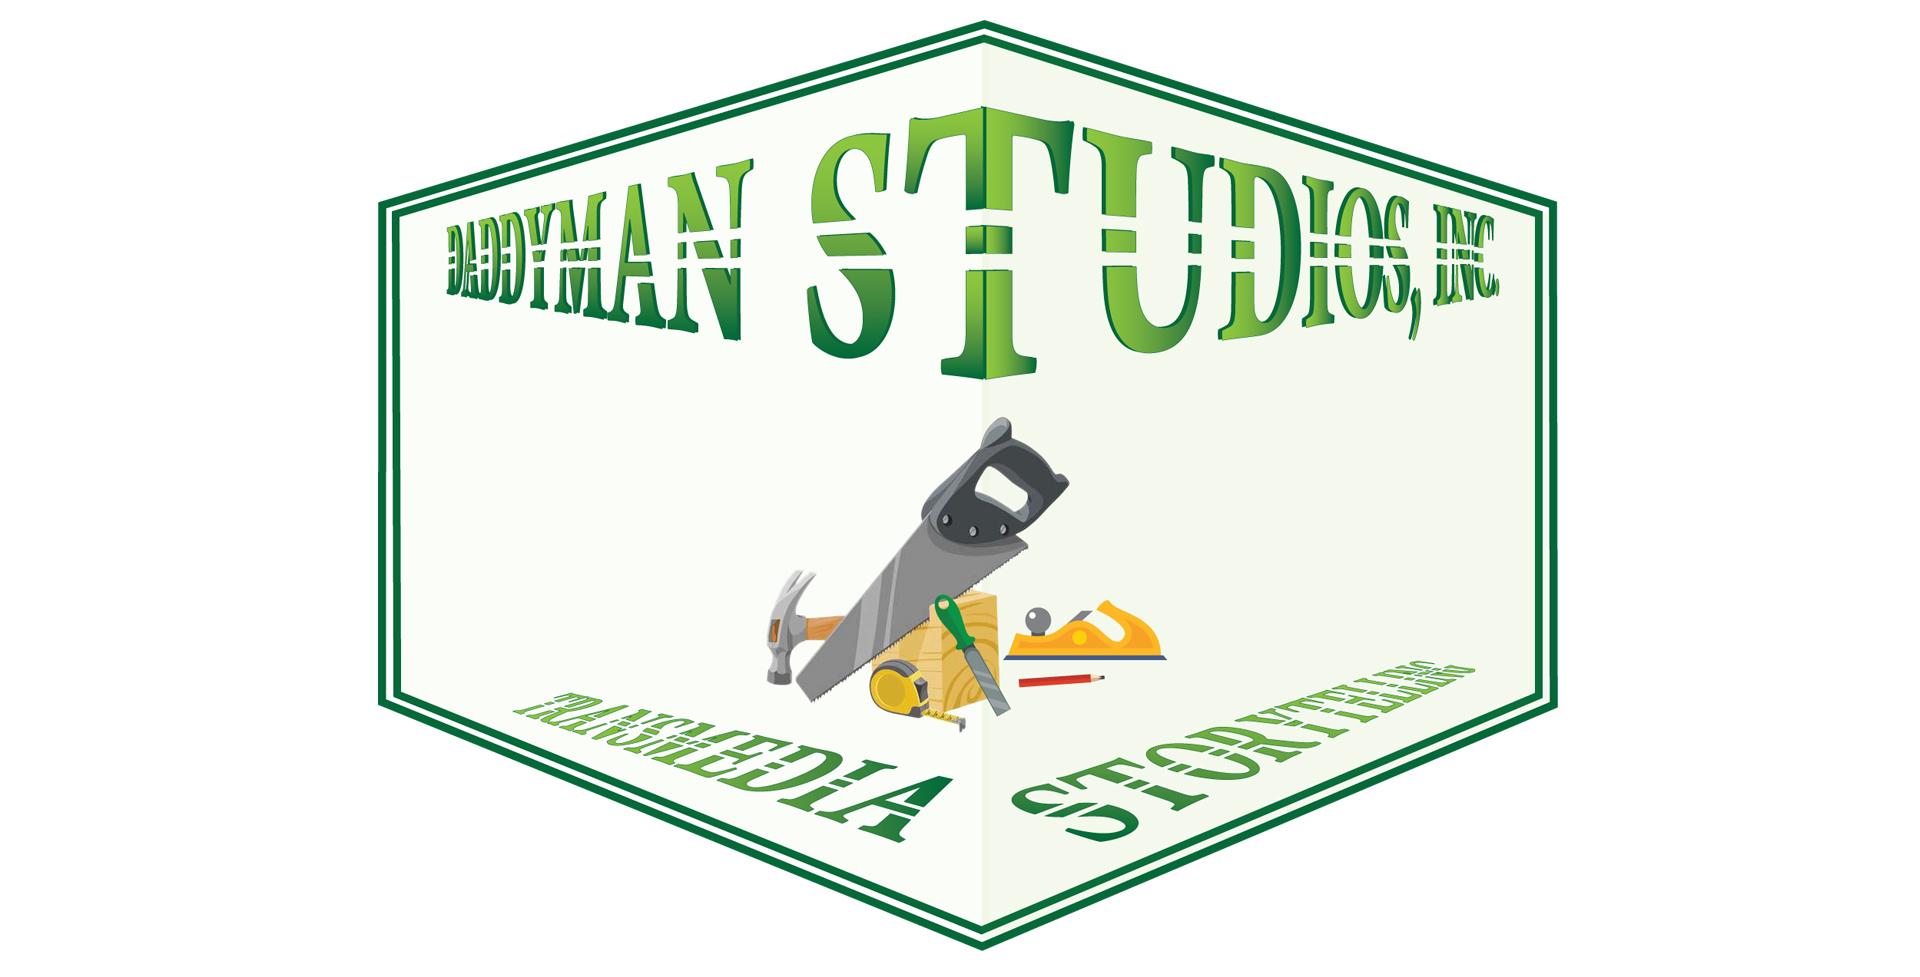 DaddyMan_Studios_logo_13-01-19-2020